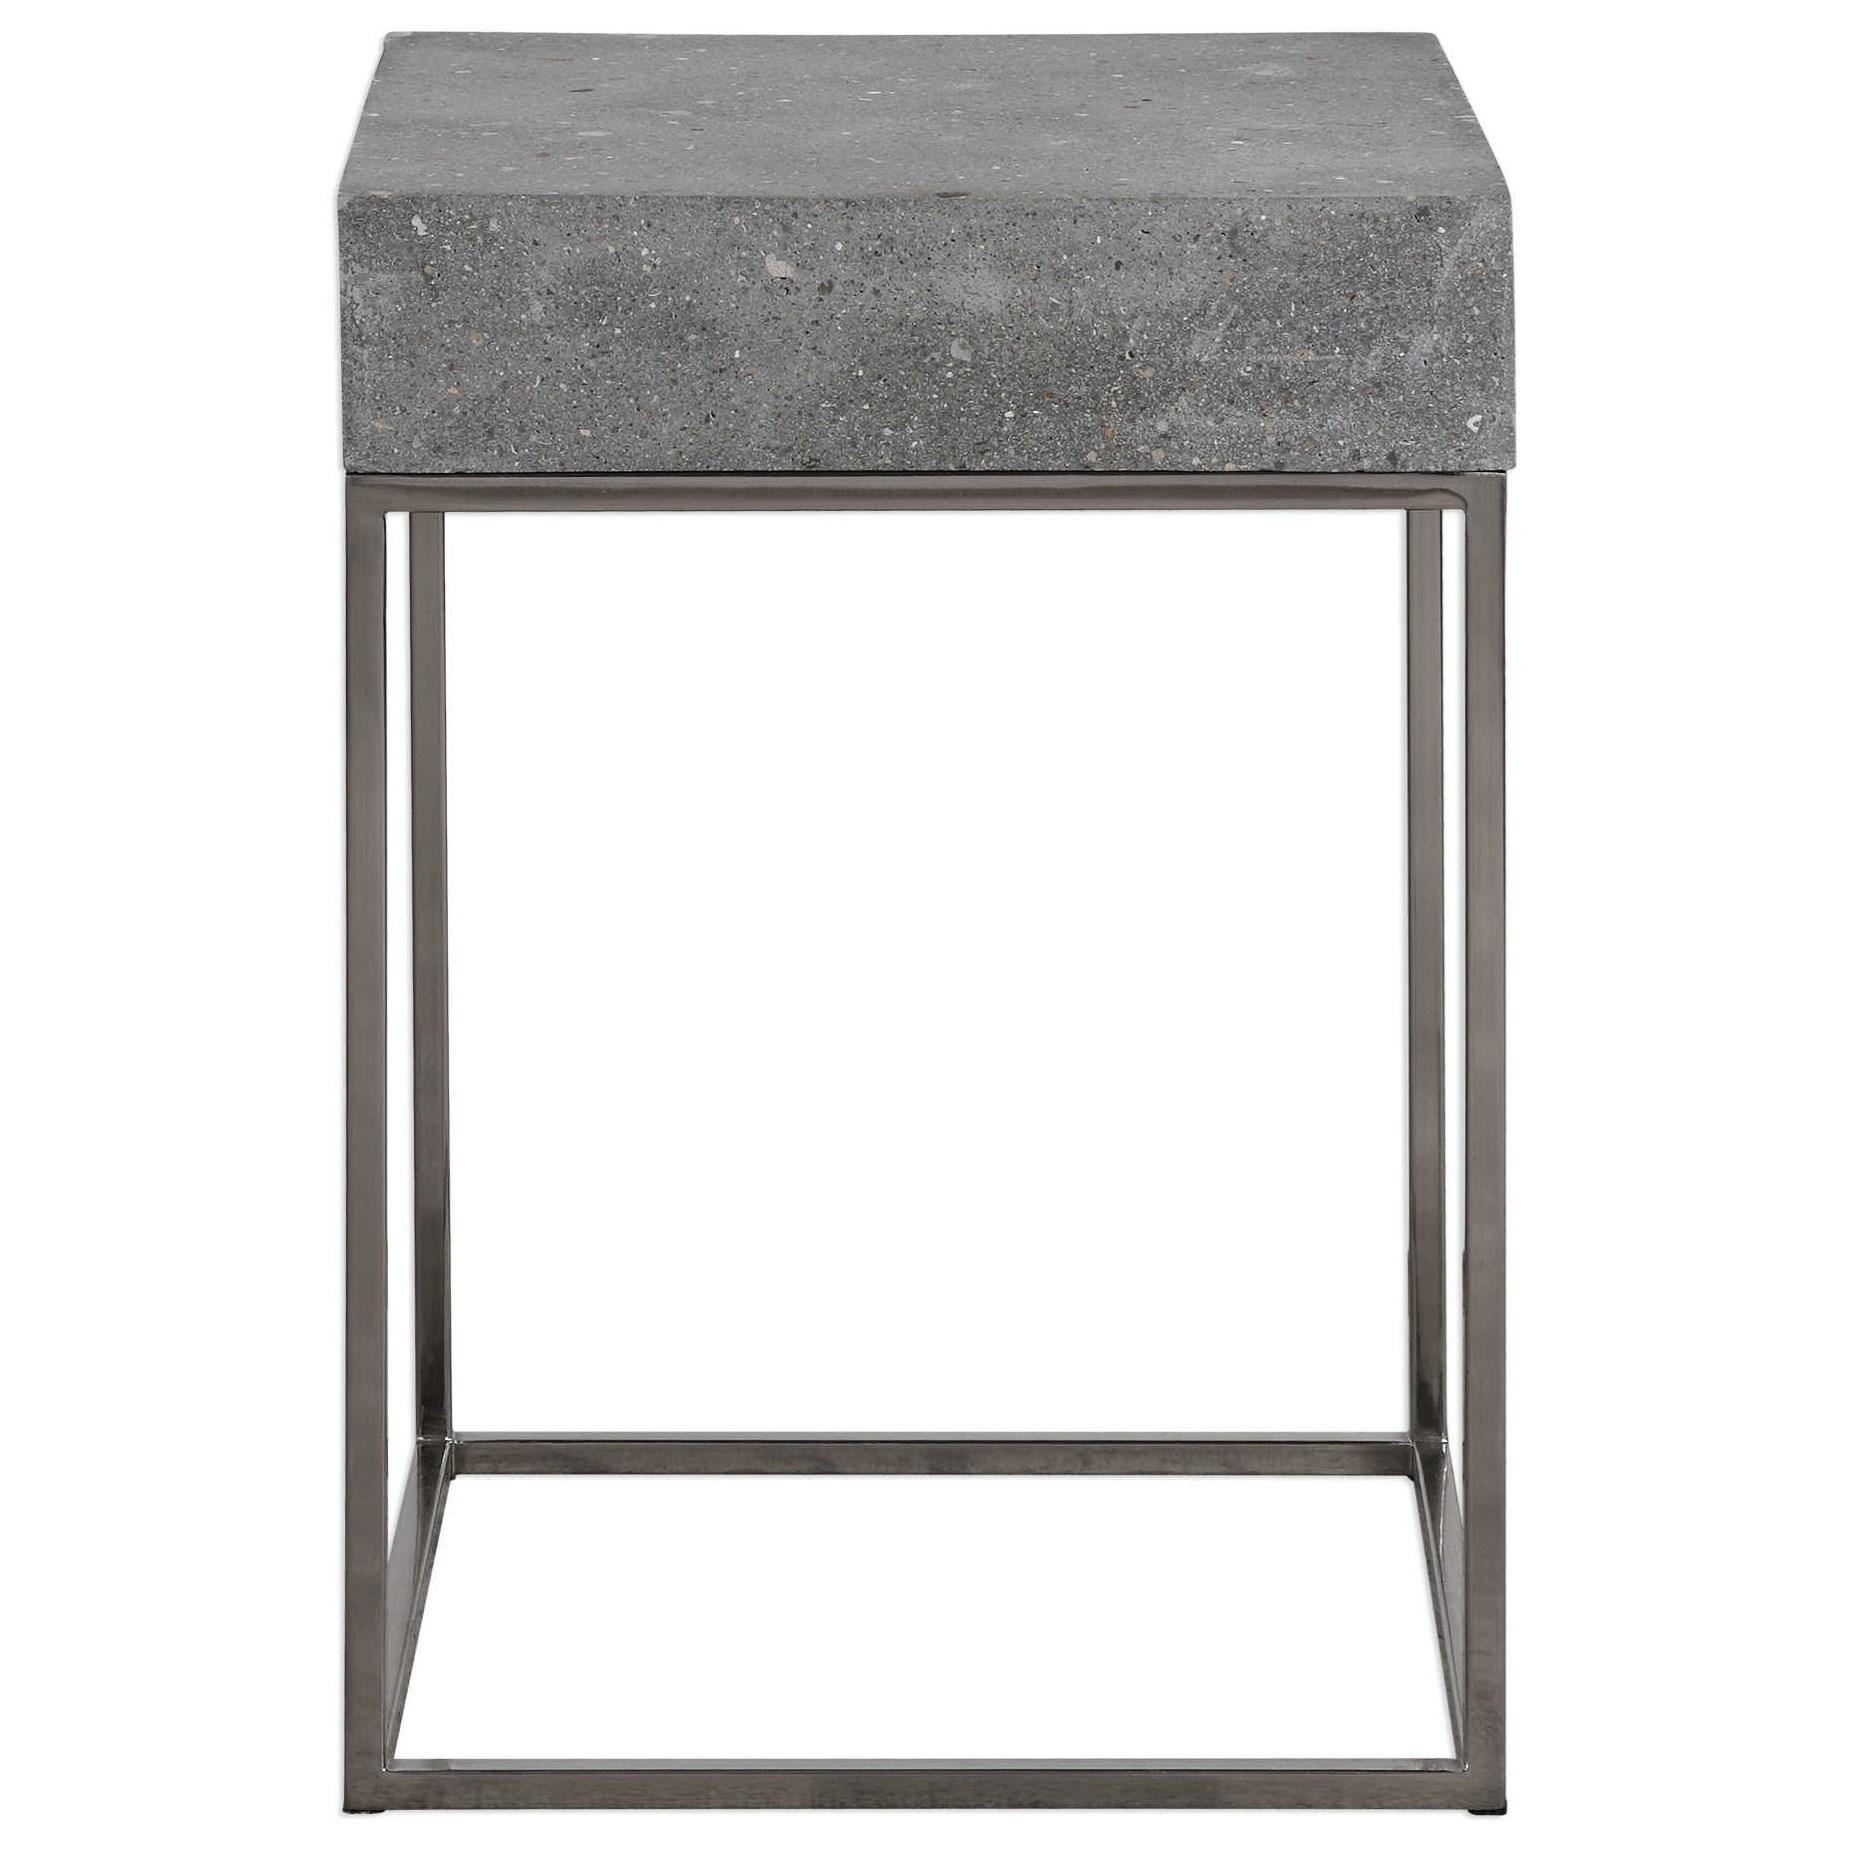 Uttermost Accent FurnitureJude Concrete Accent Table ...